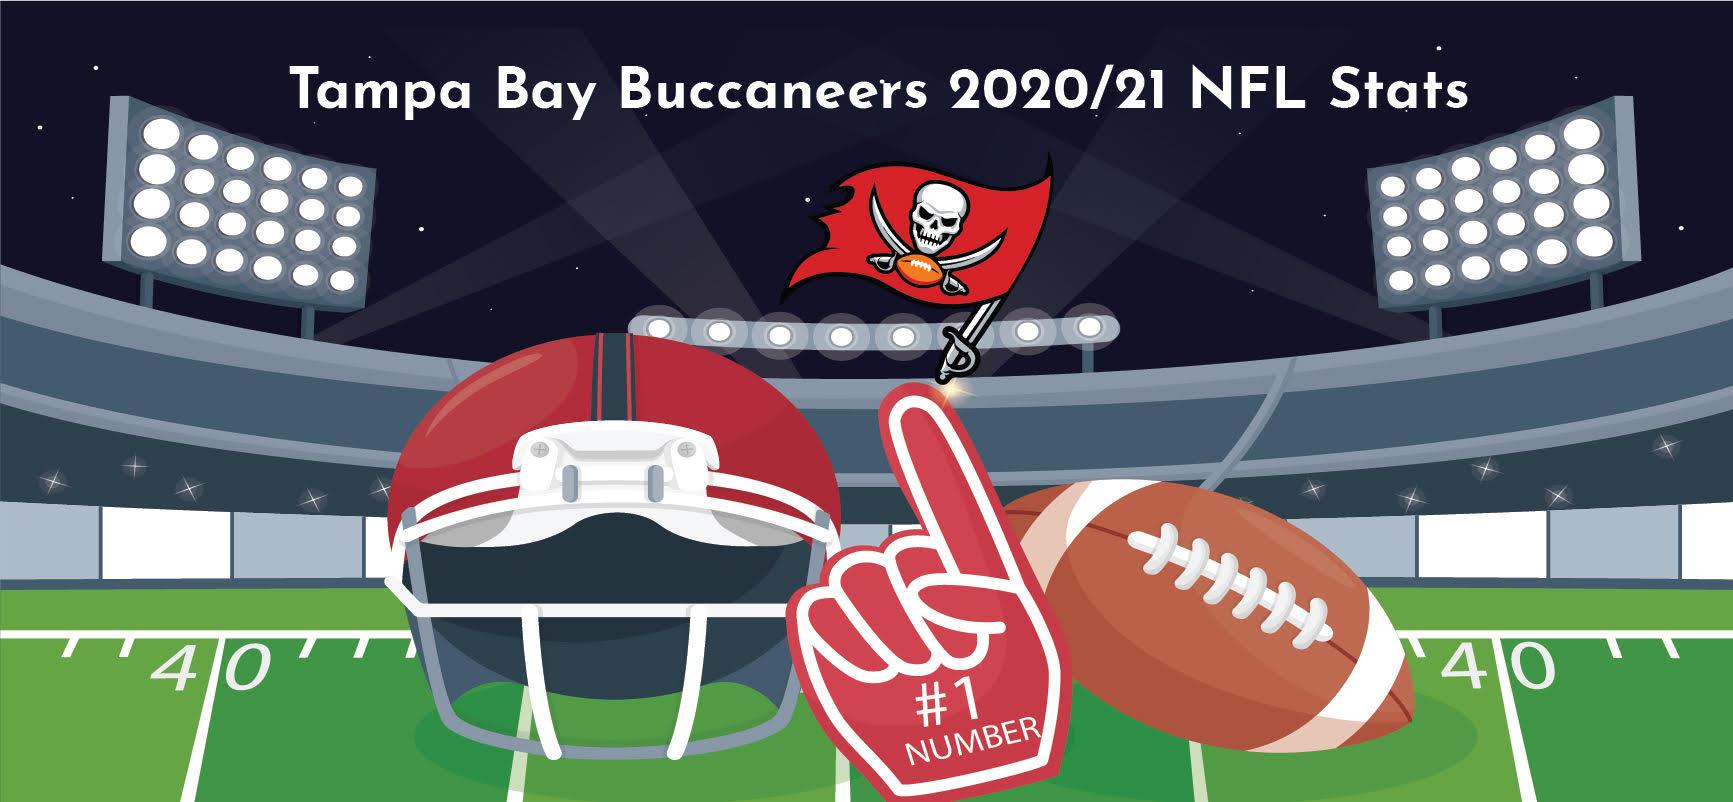 Tampa Bay Buccaneers 2020/21 NFL Season Stats (Infographic)